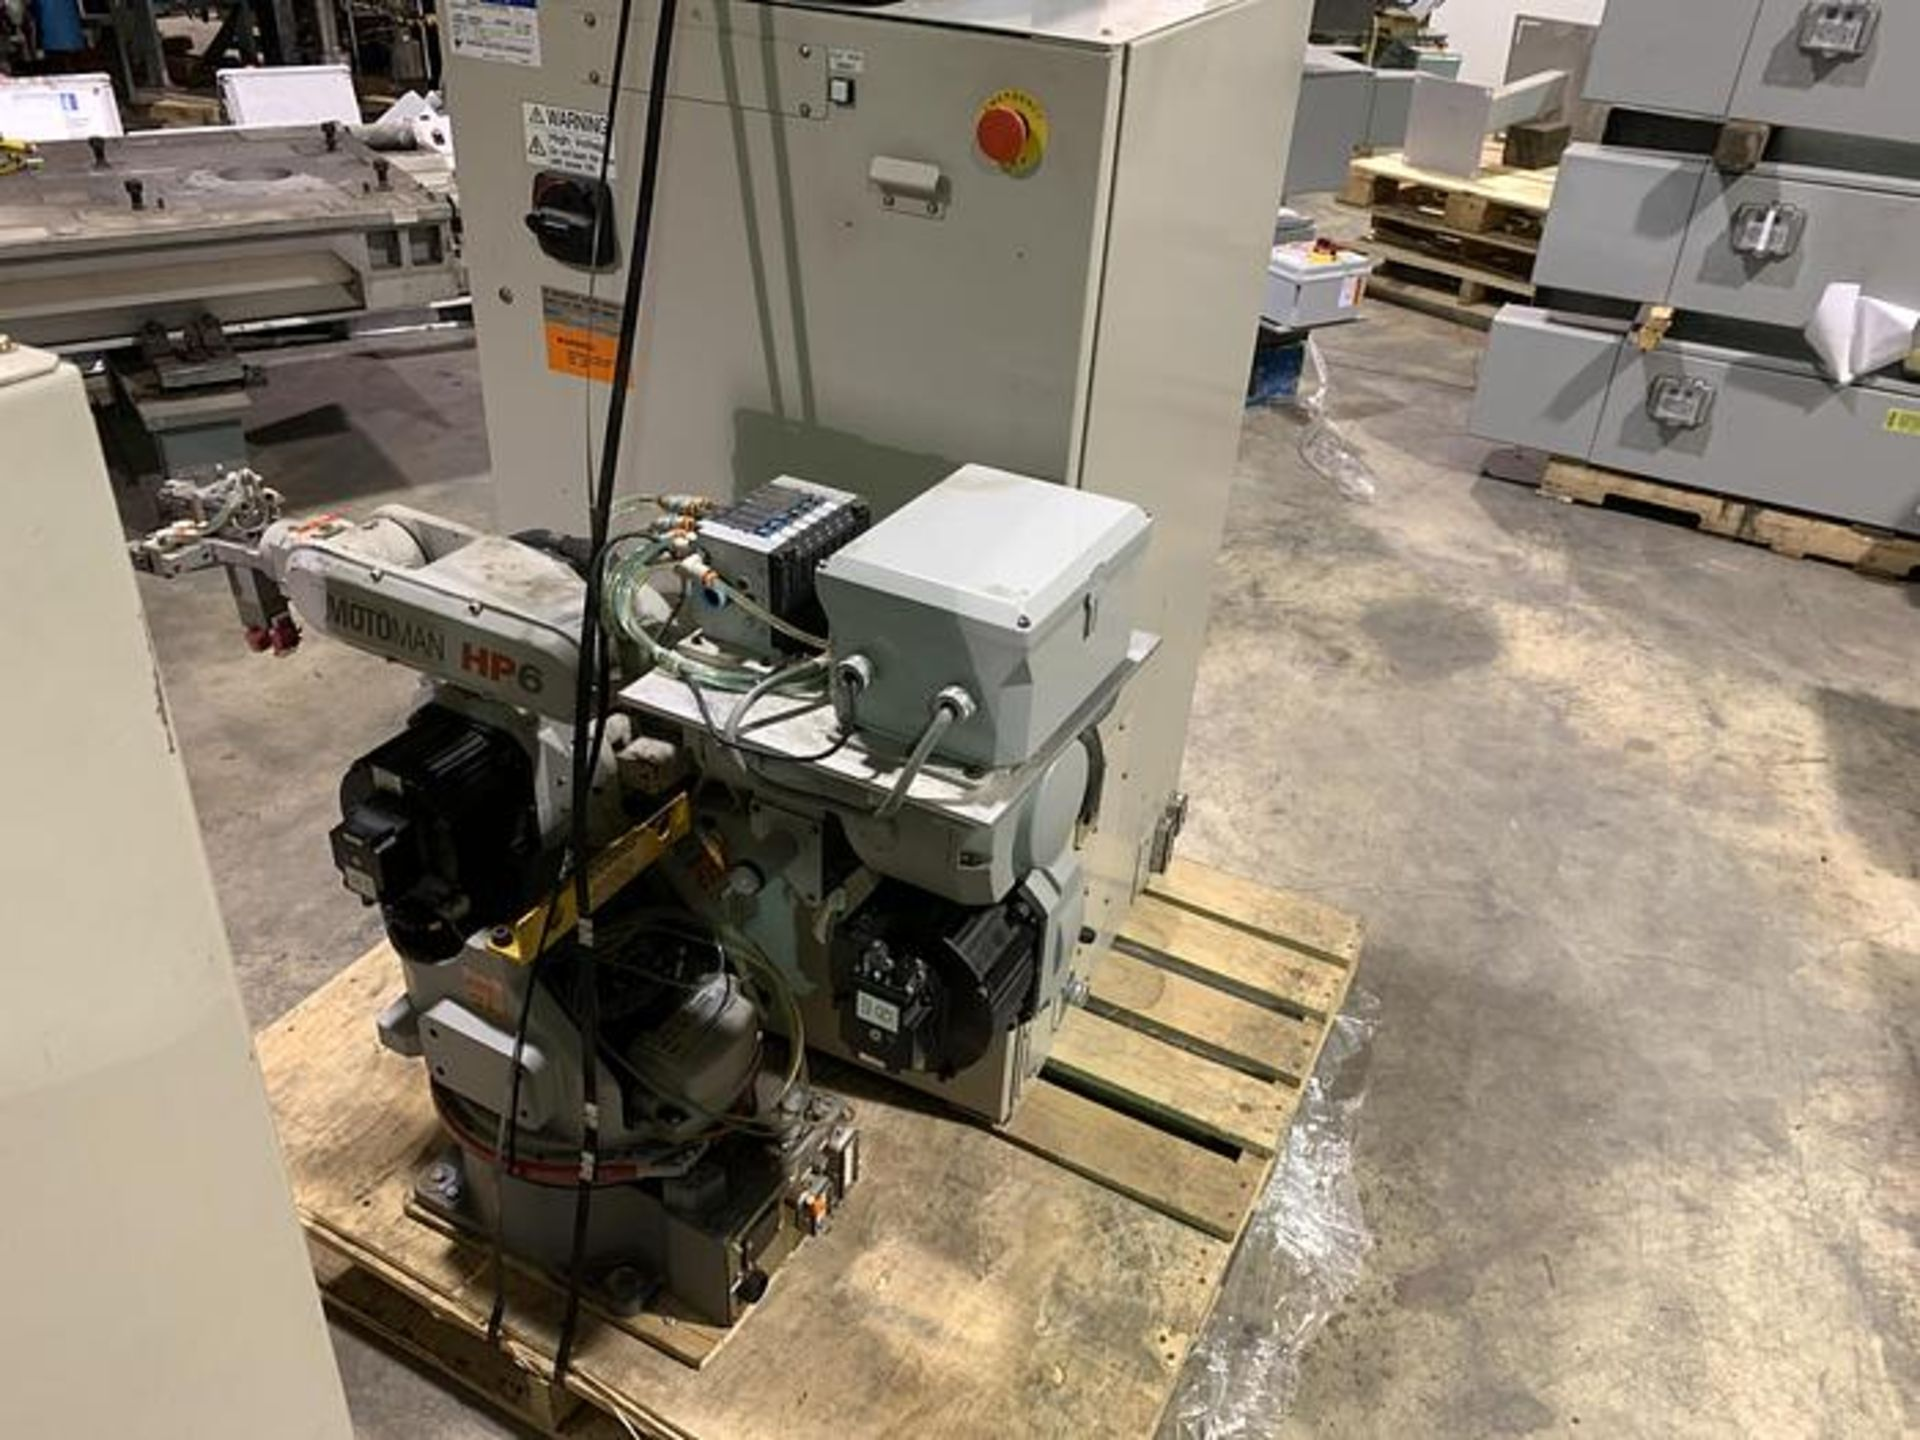 MOTOMAN ROBOT HP6 6KG X 1378 MM REACH NX100 CONTROLLER, CABLES & TEACH, SN S4M230-1-6, YEAR 04/2005